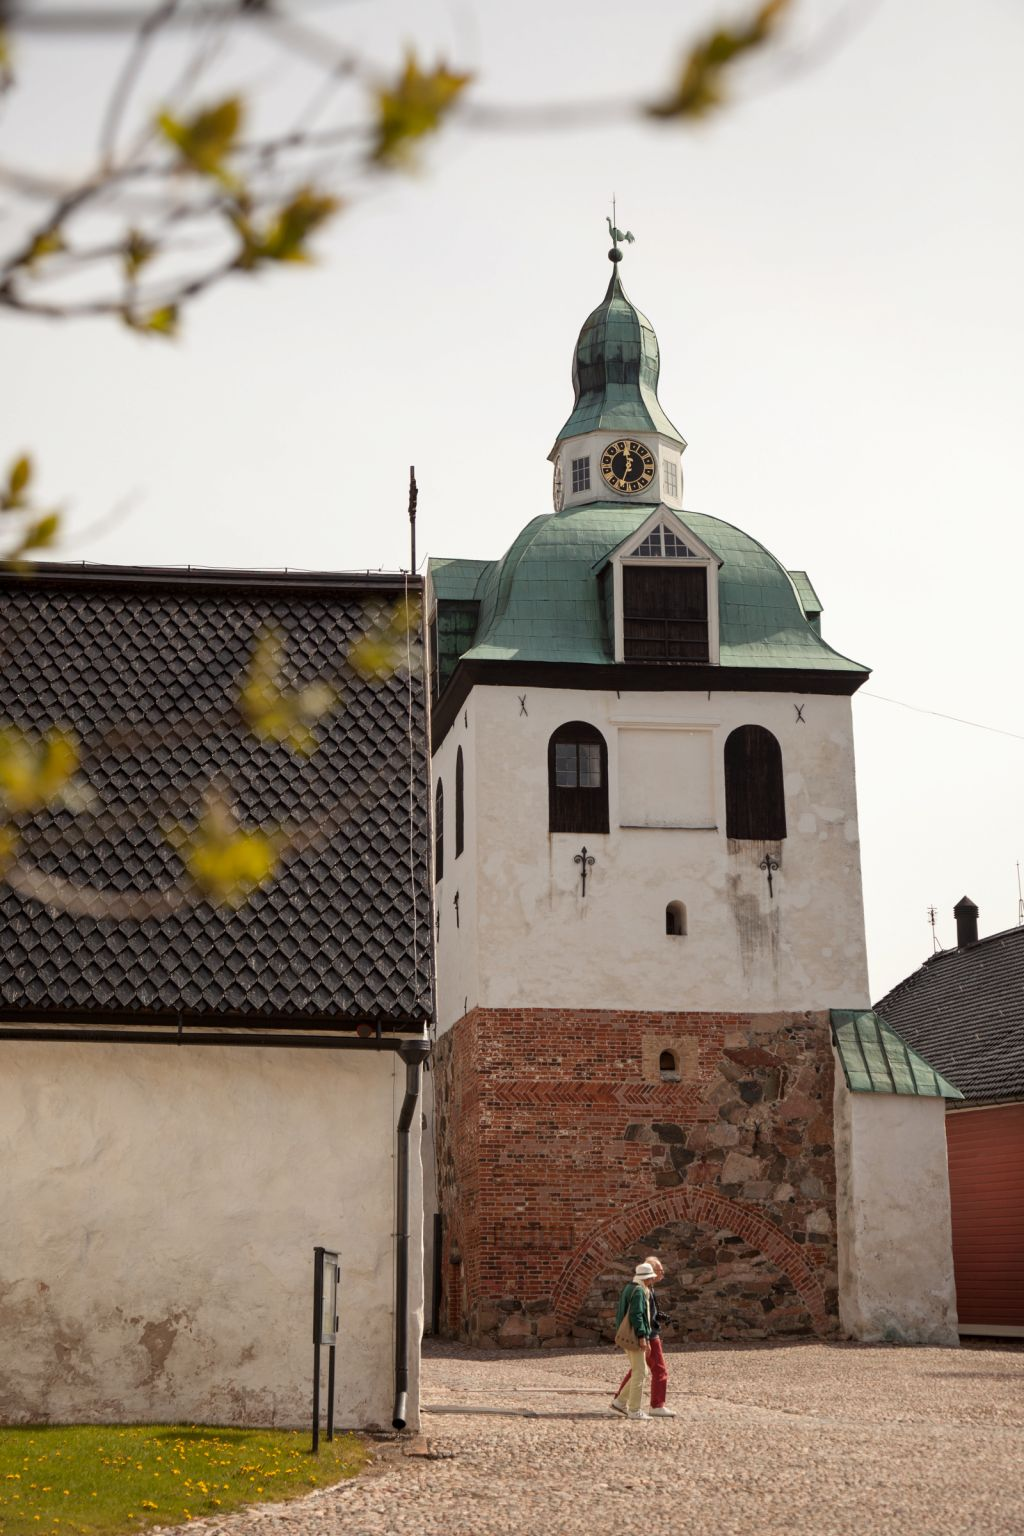 Lilla kyrkan i Borgå.